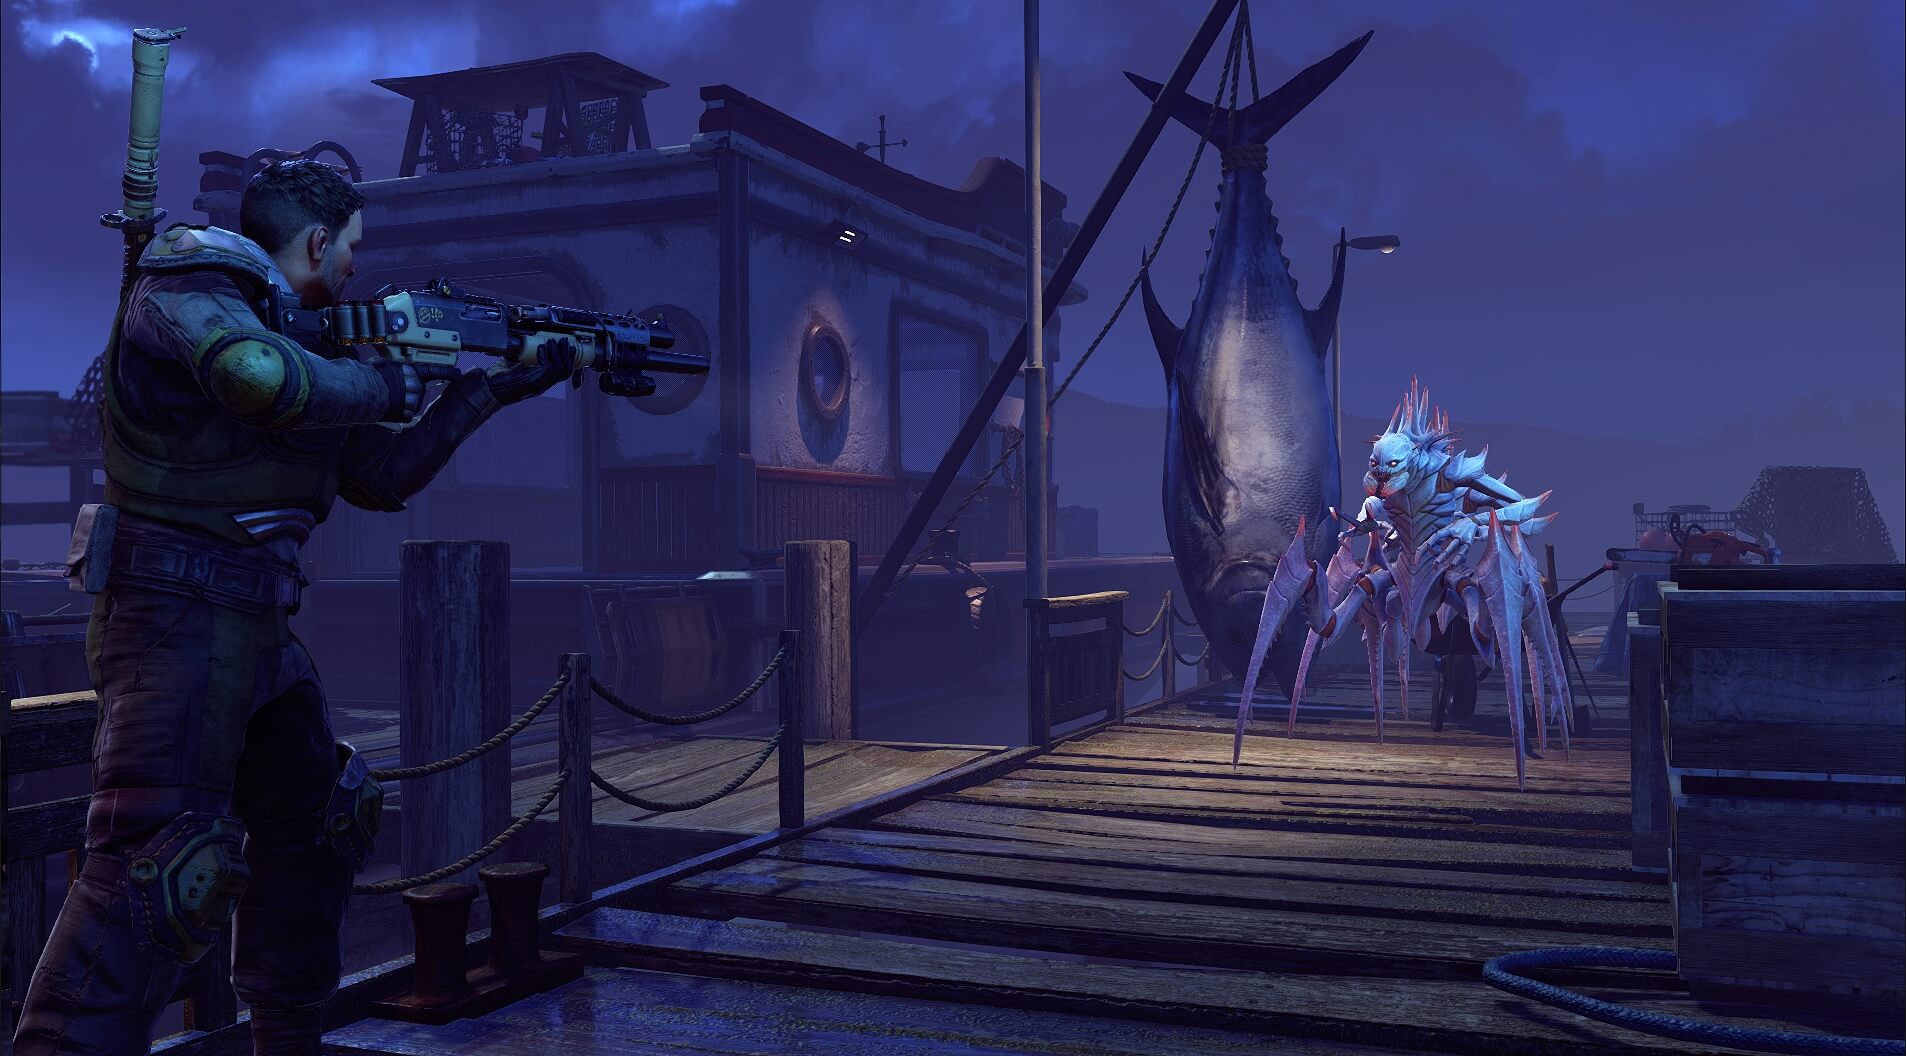 XCOM 2: War of the Chosen - Tactical Legacy Pack (ROW)